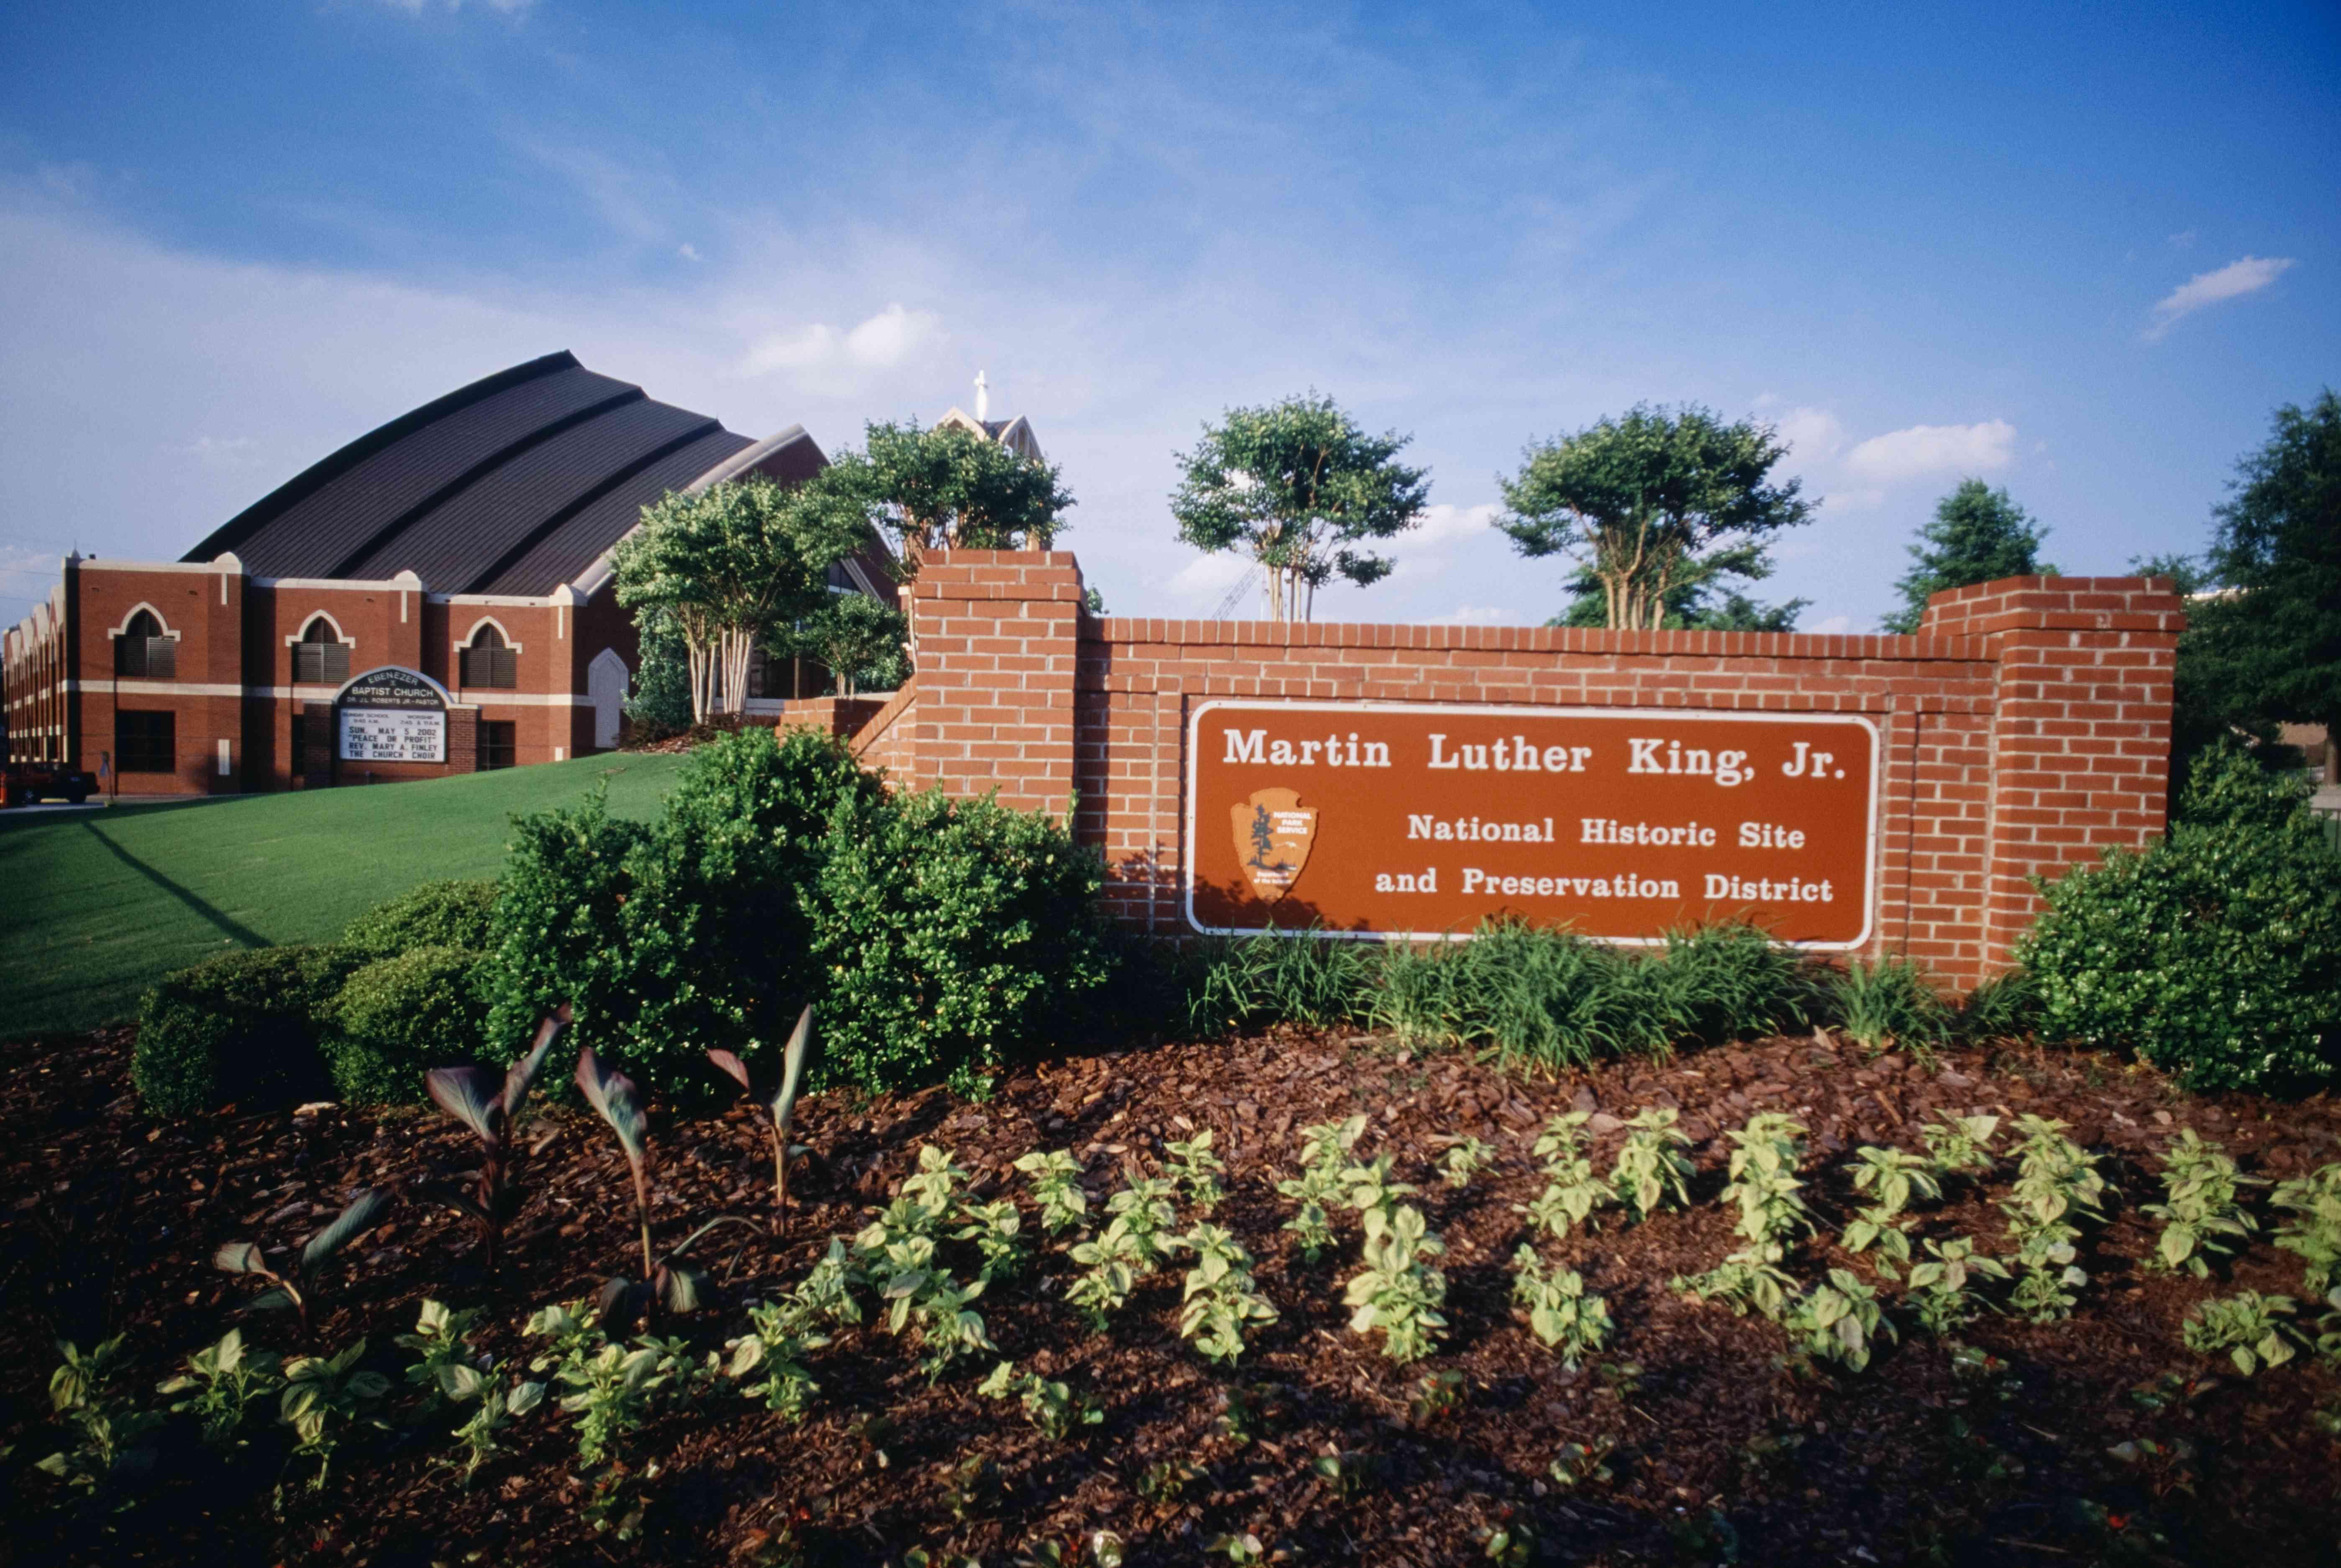 Martin Luther King Jr. National Historic Site, Atlanta, Georgia, United States of America